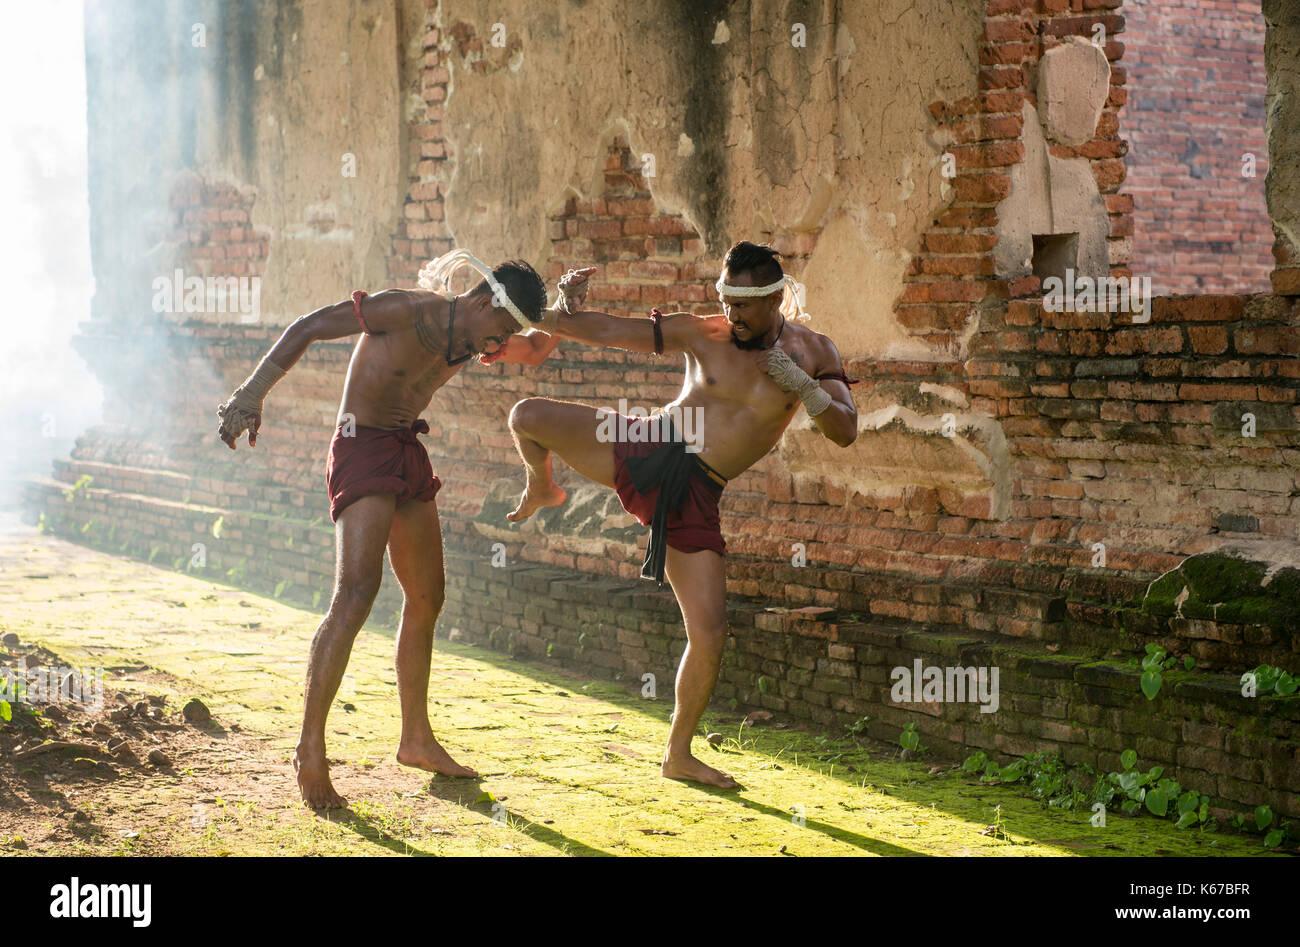 Two Thai boxers fighting, Thailand - Stock Image